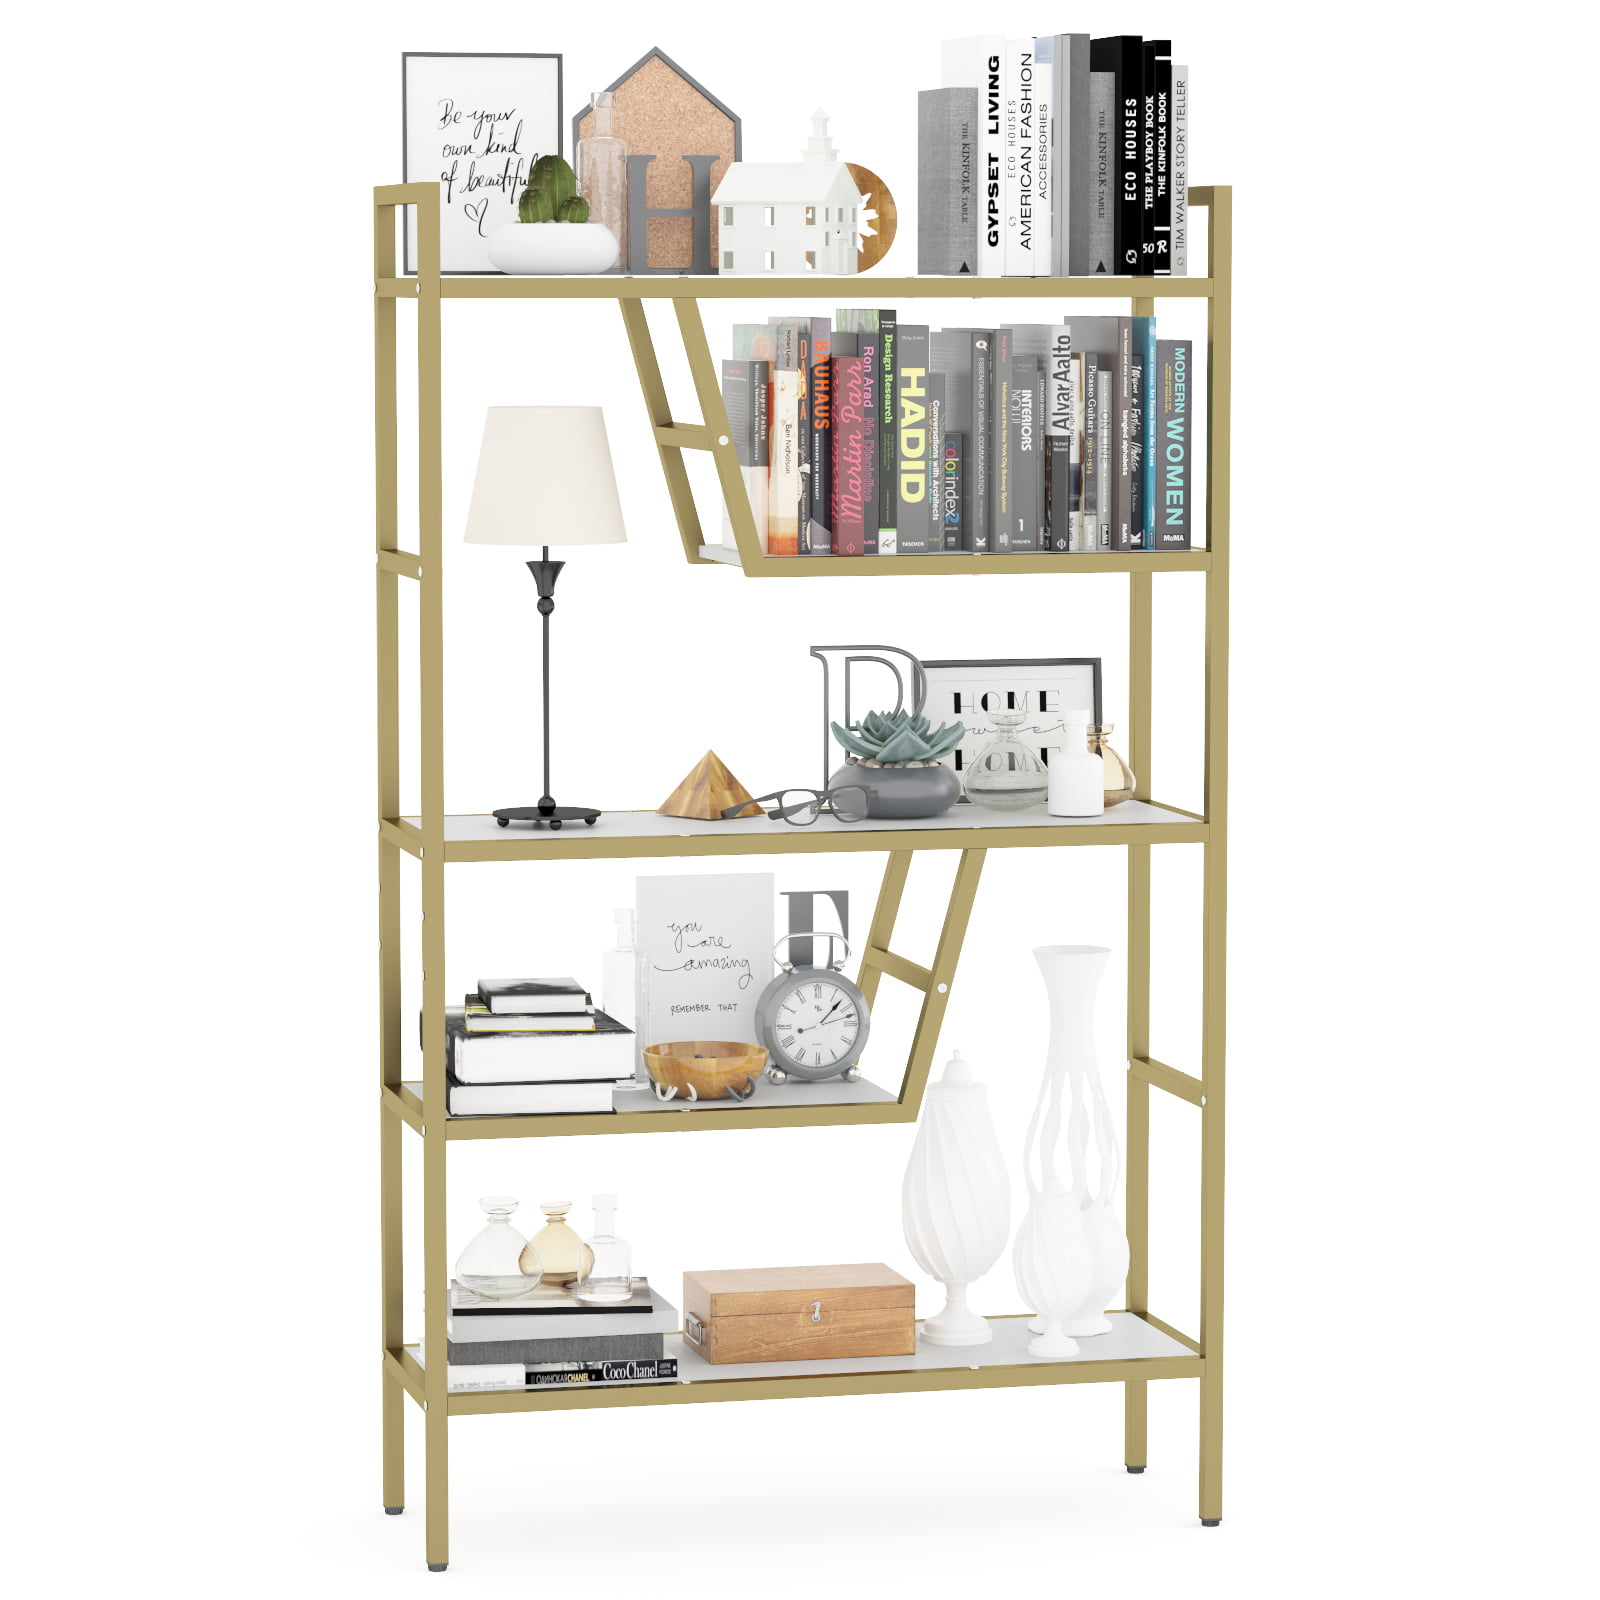 Multifunctional 5 Shelf Metal Bookcase Ladder Plant Flower Stand Diy Rack Storage Gold Walmart Com Walmart Com